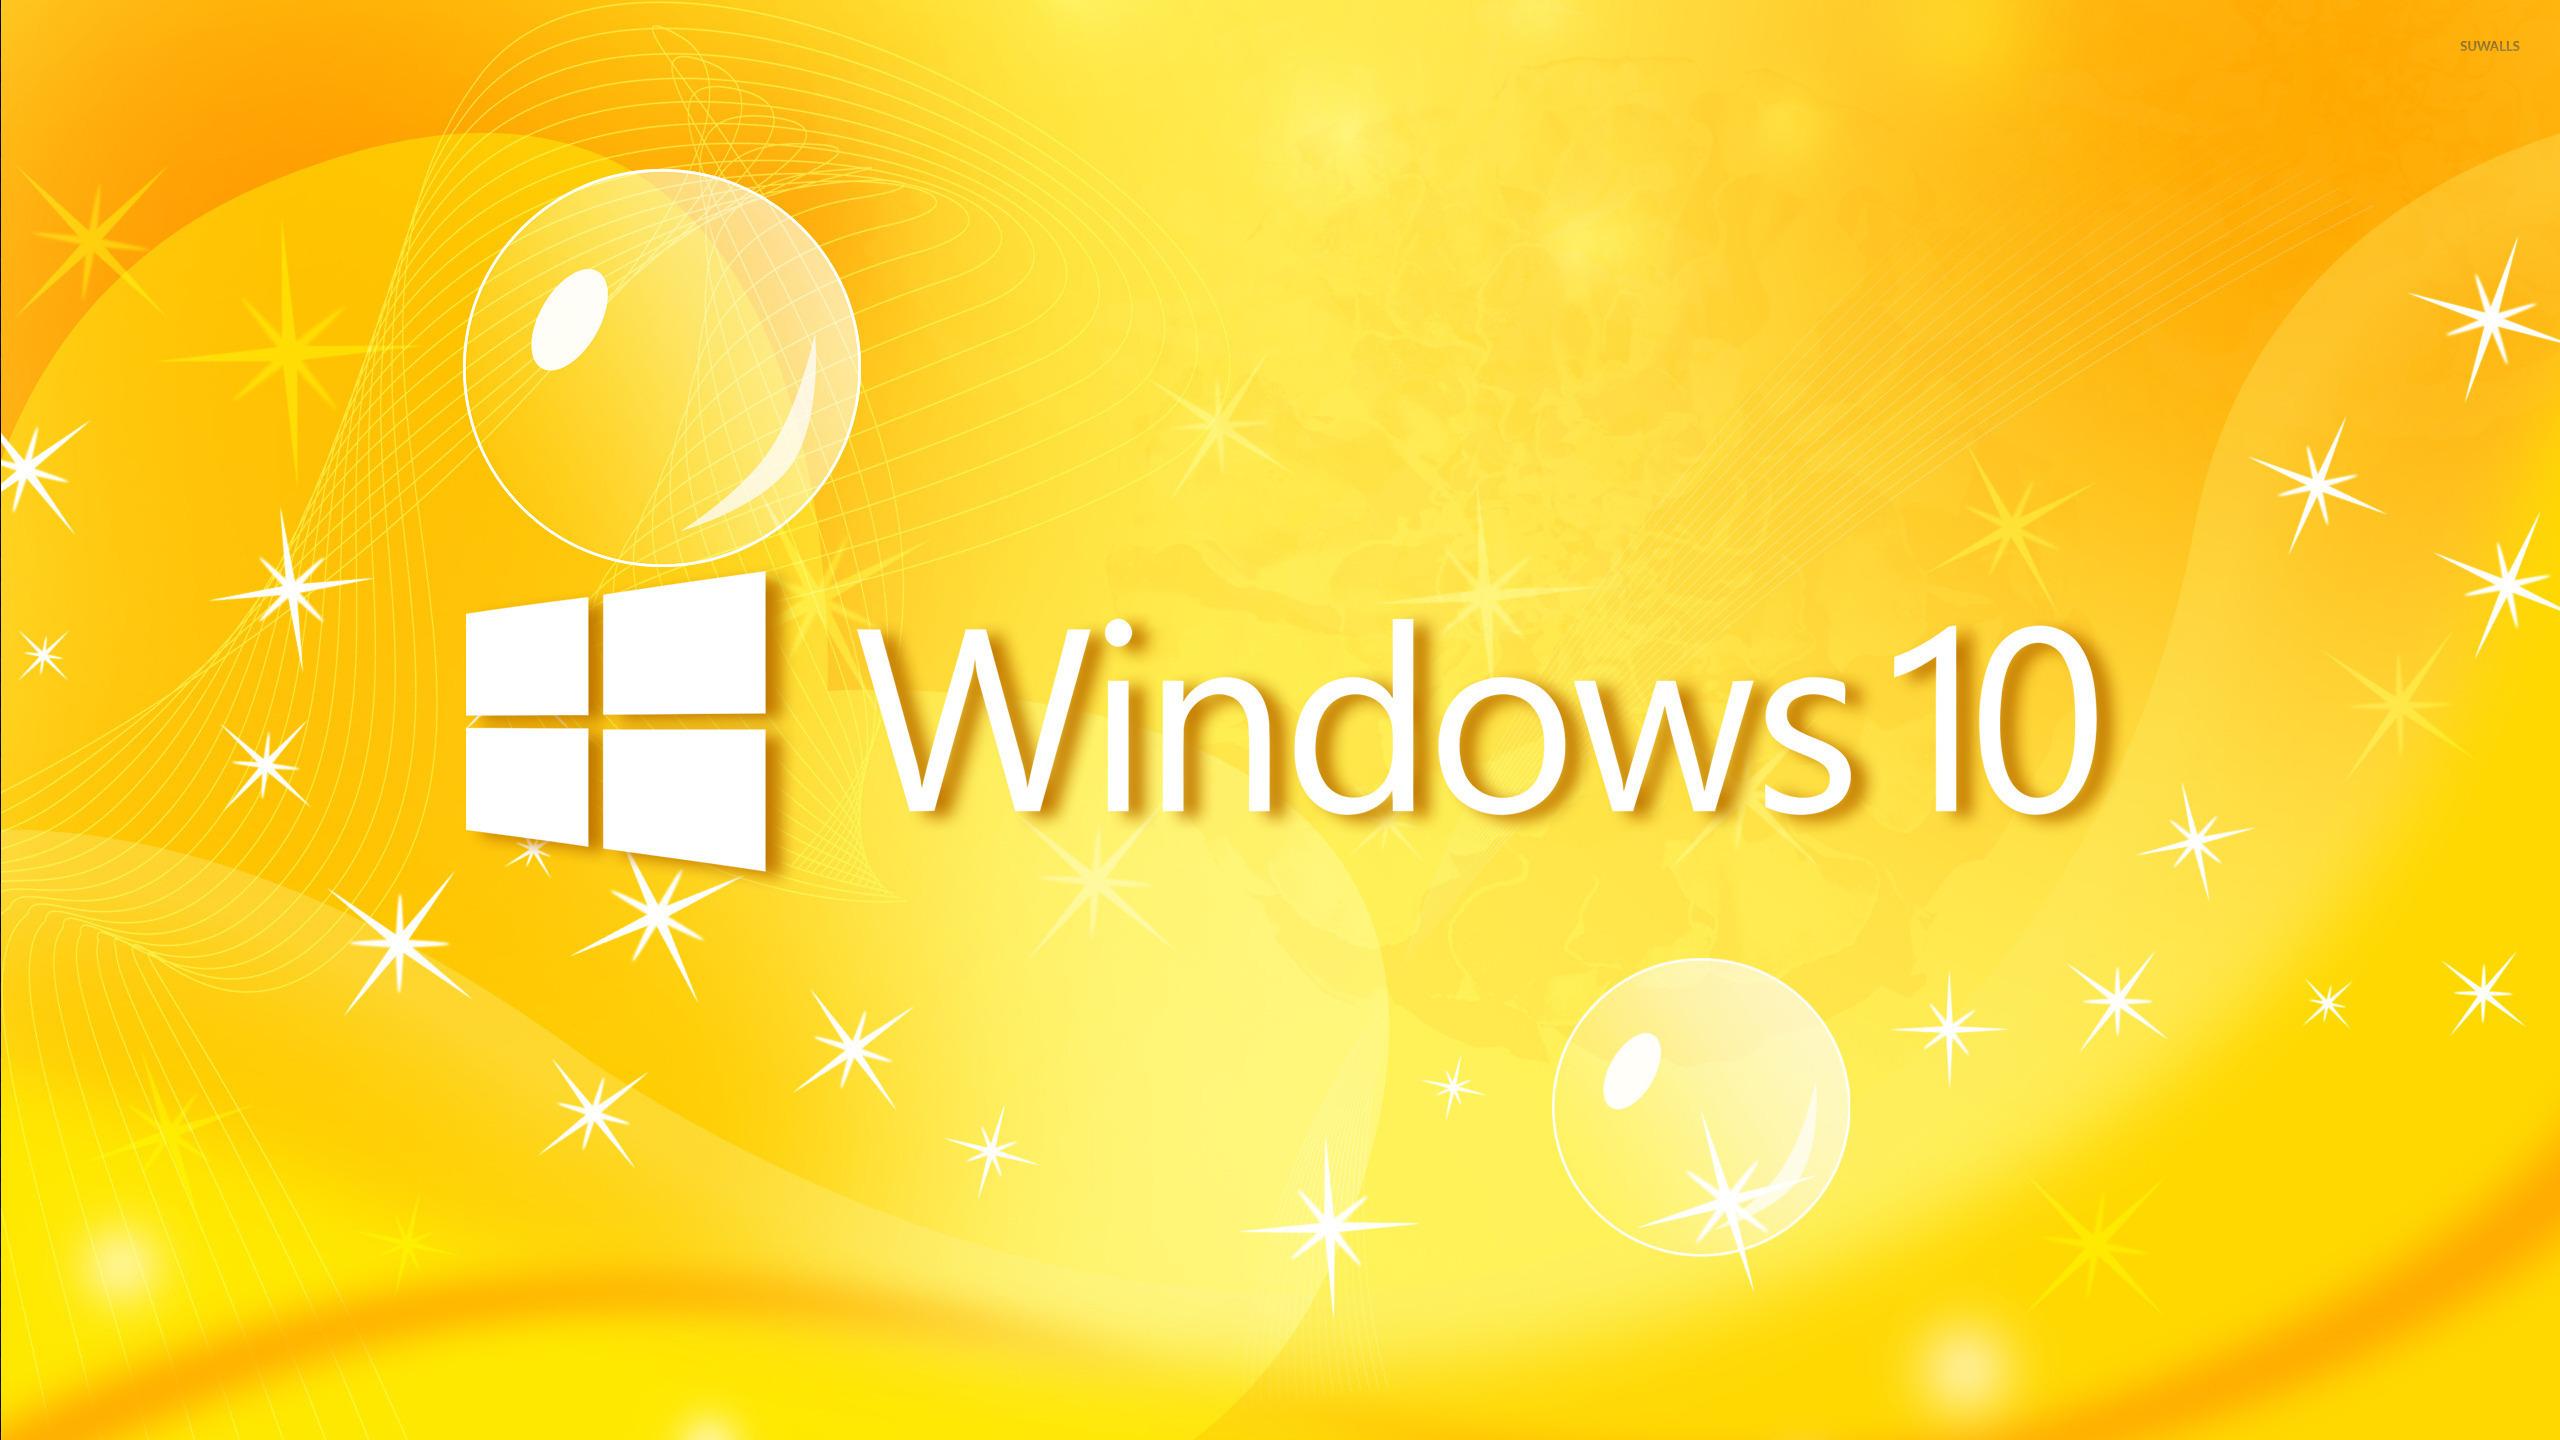 windows 10 text logo on yellow curves wallpaper computer